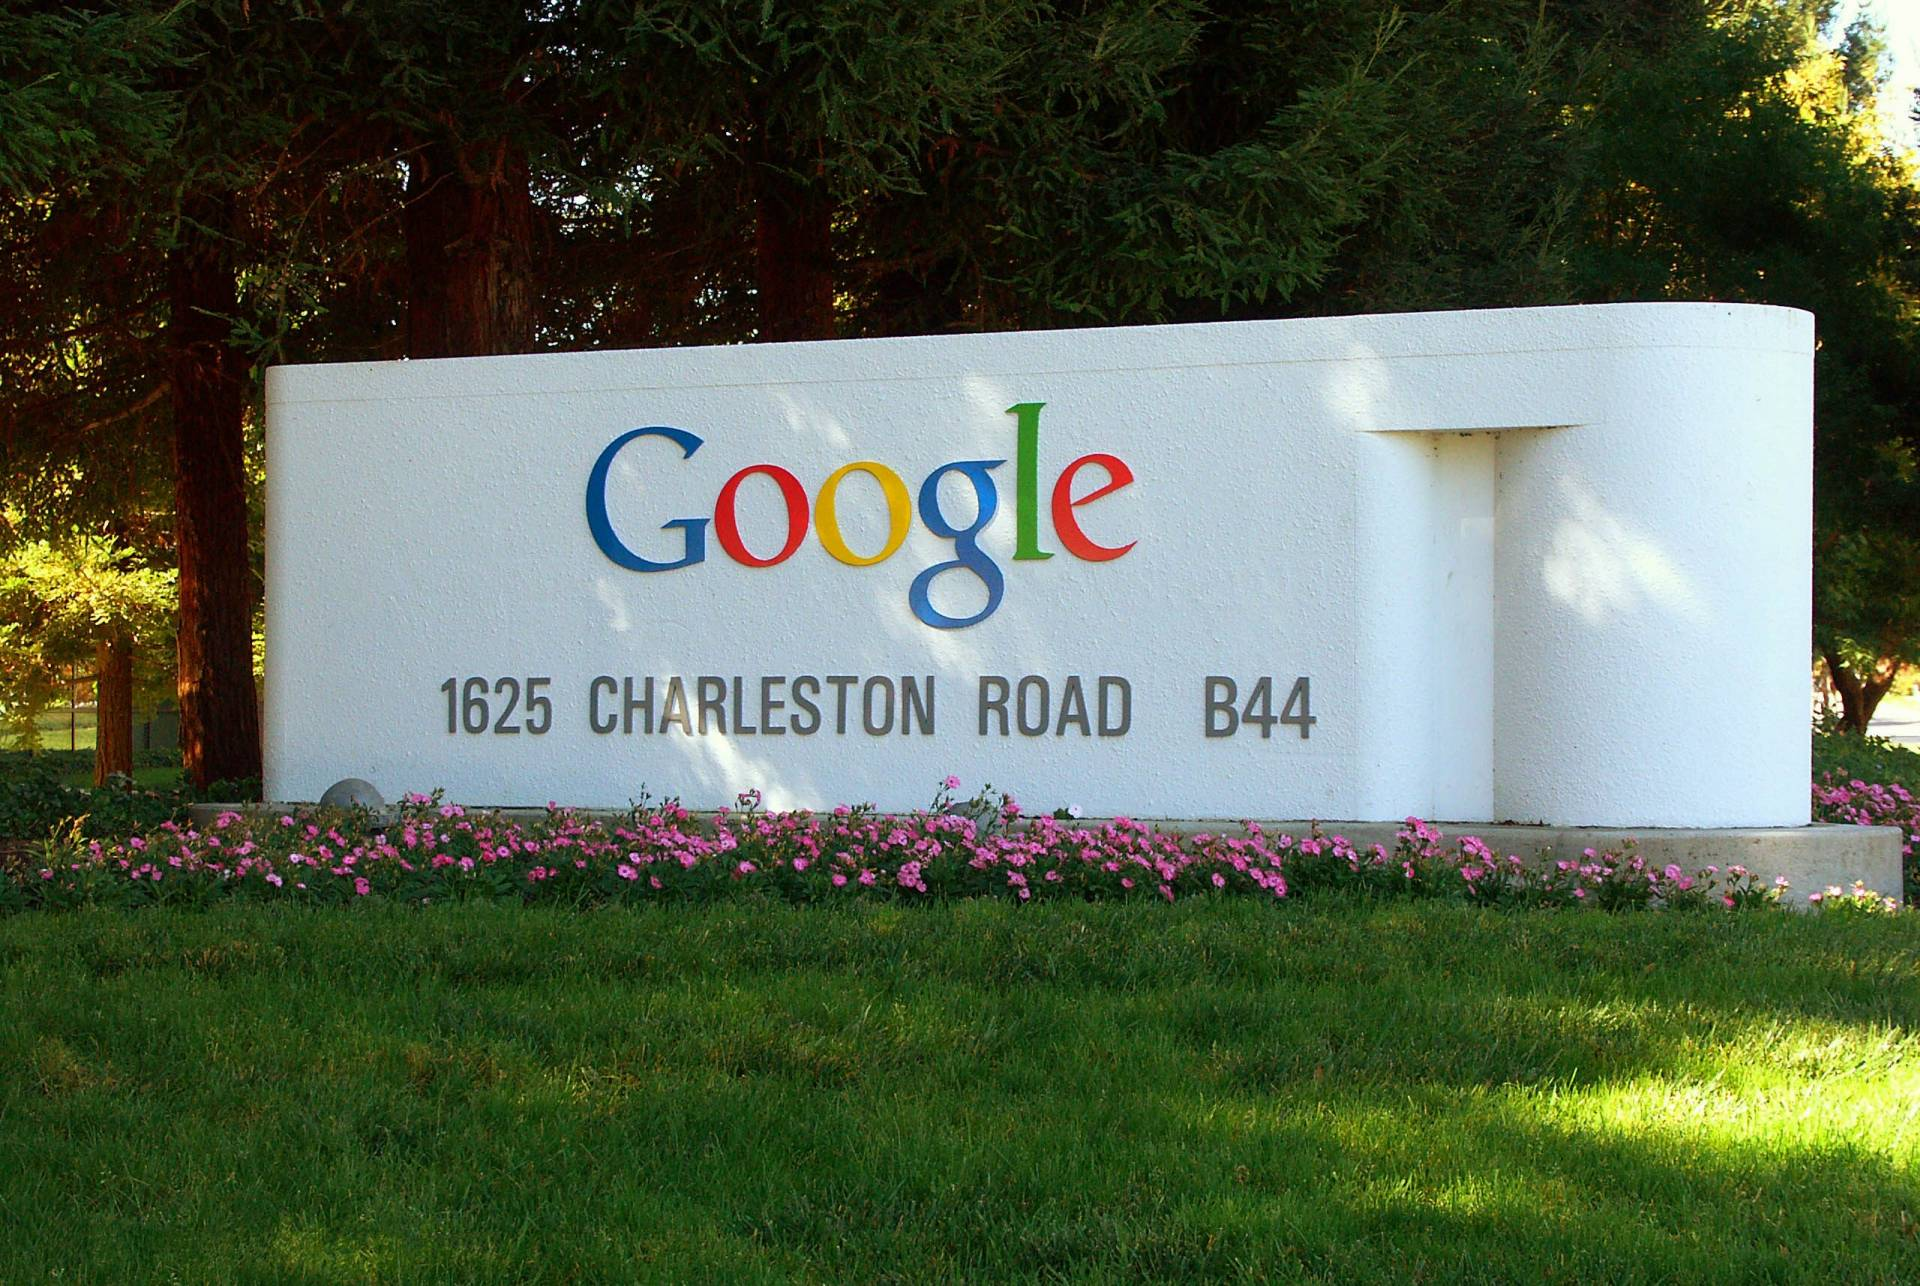 Google y YouTube sufren importantes caídas a nivel mundial por tercera vez en 10 días